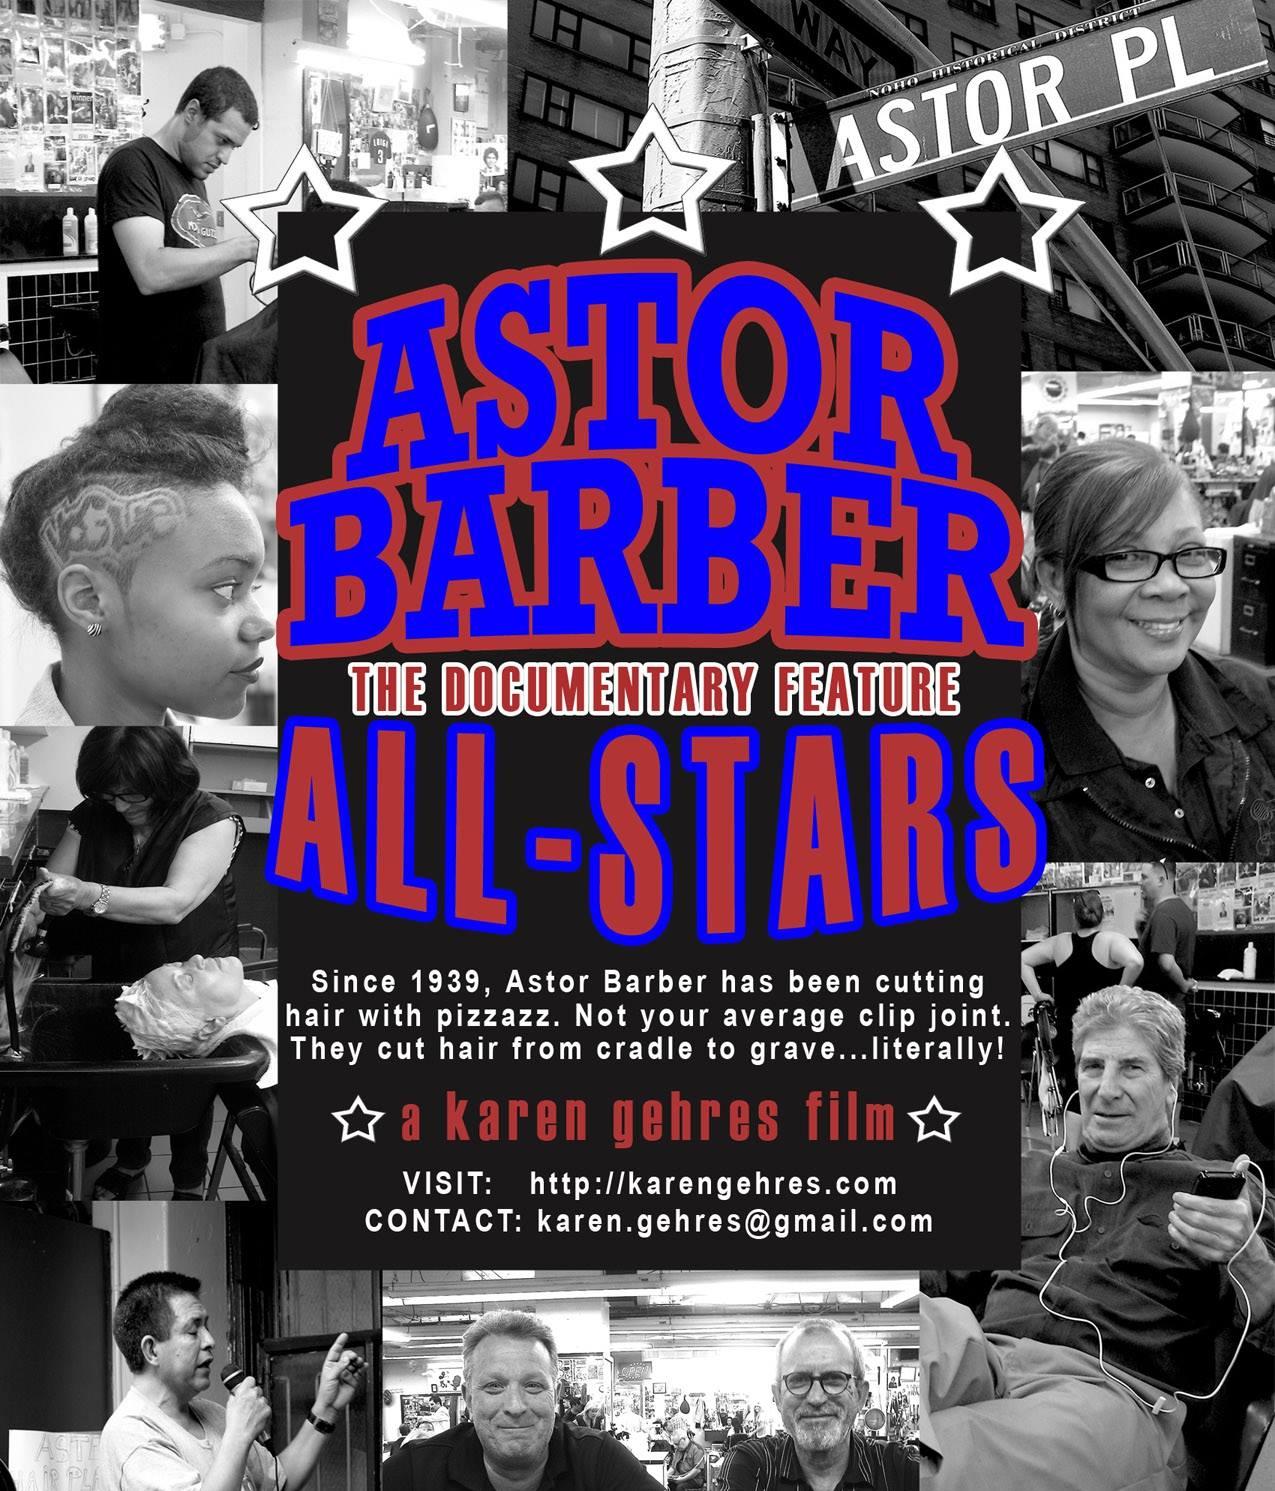 Astor Barber All Stars 2014 Imdb